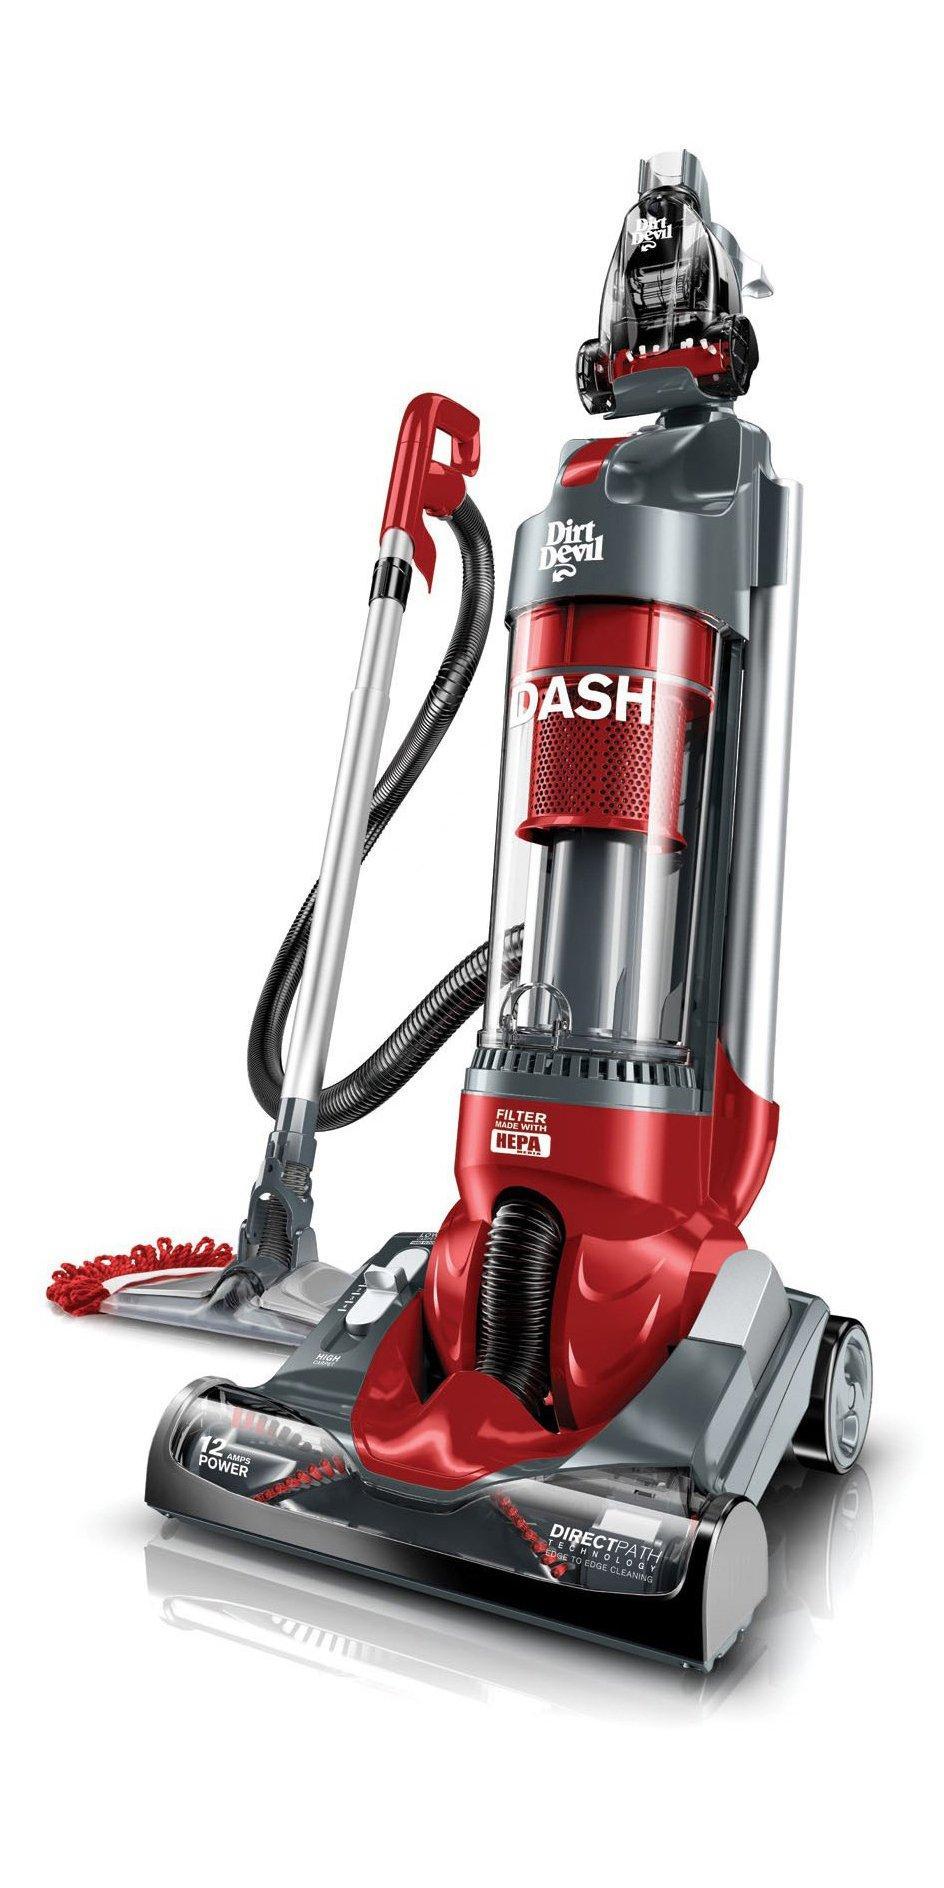 Dash Cyclonic Upright Vacuum1